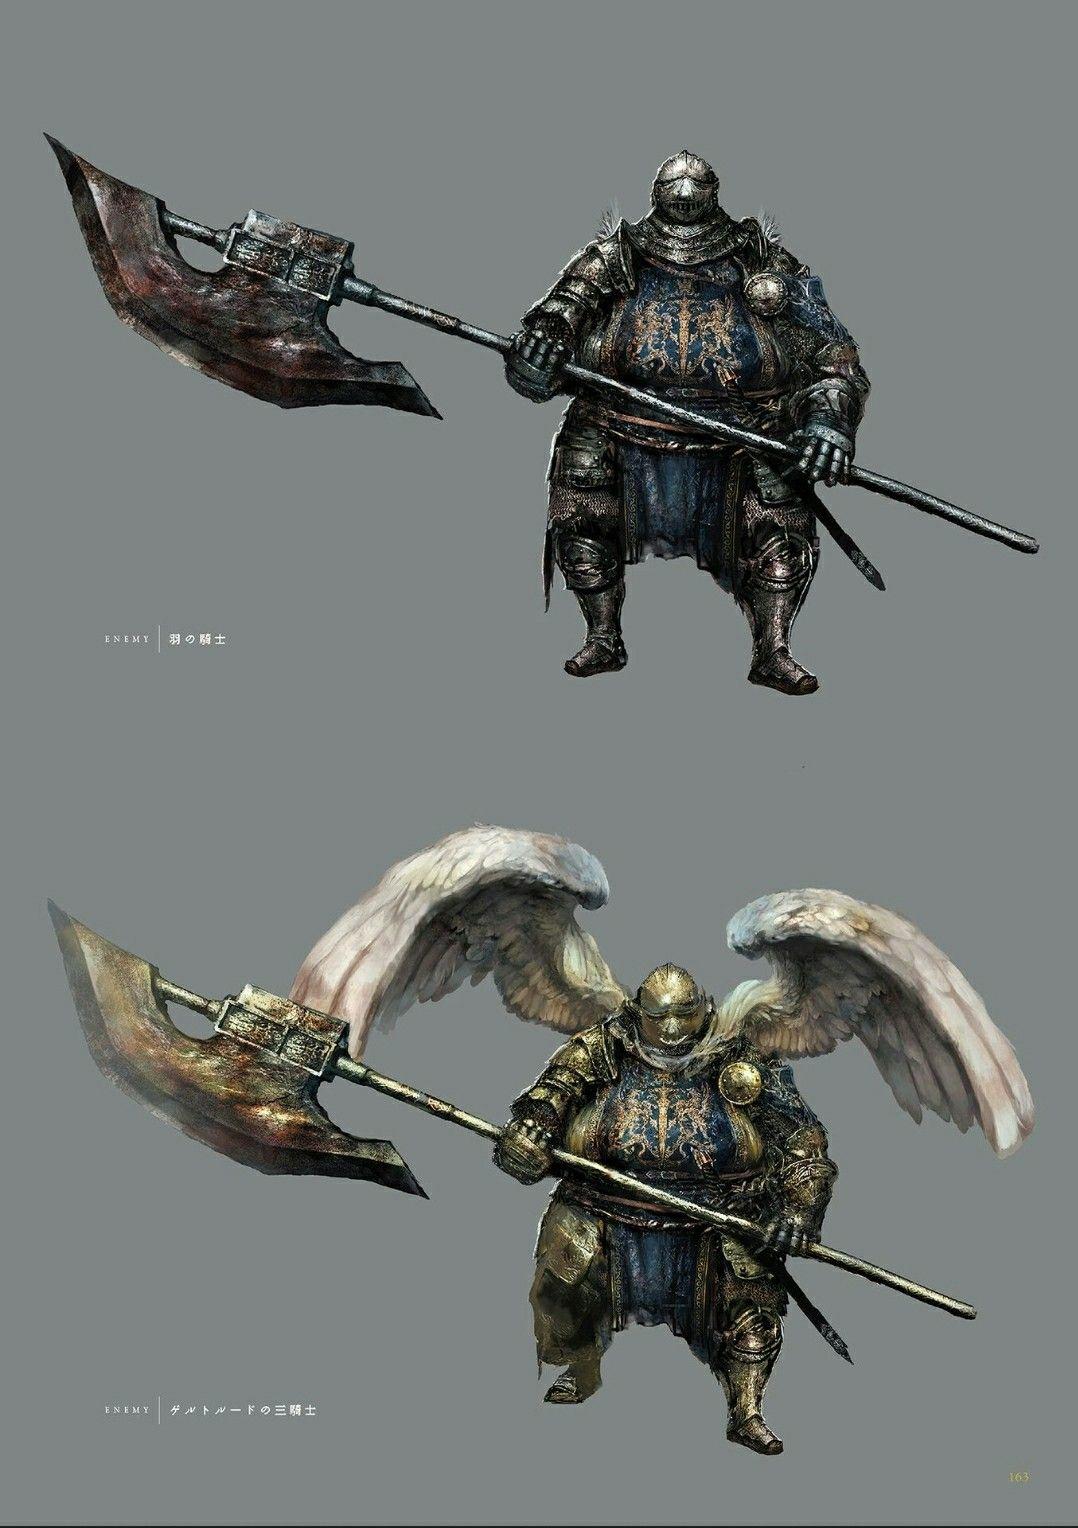 Pin By Tii On Dark Souls Dark Souls Art Dark Souls Dark Souls 3